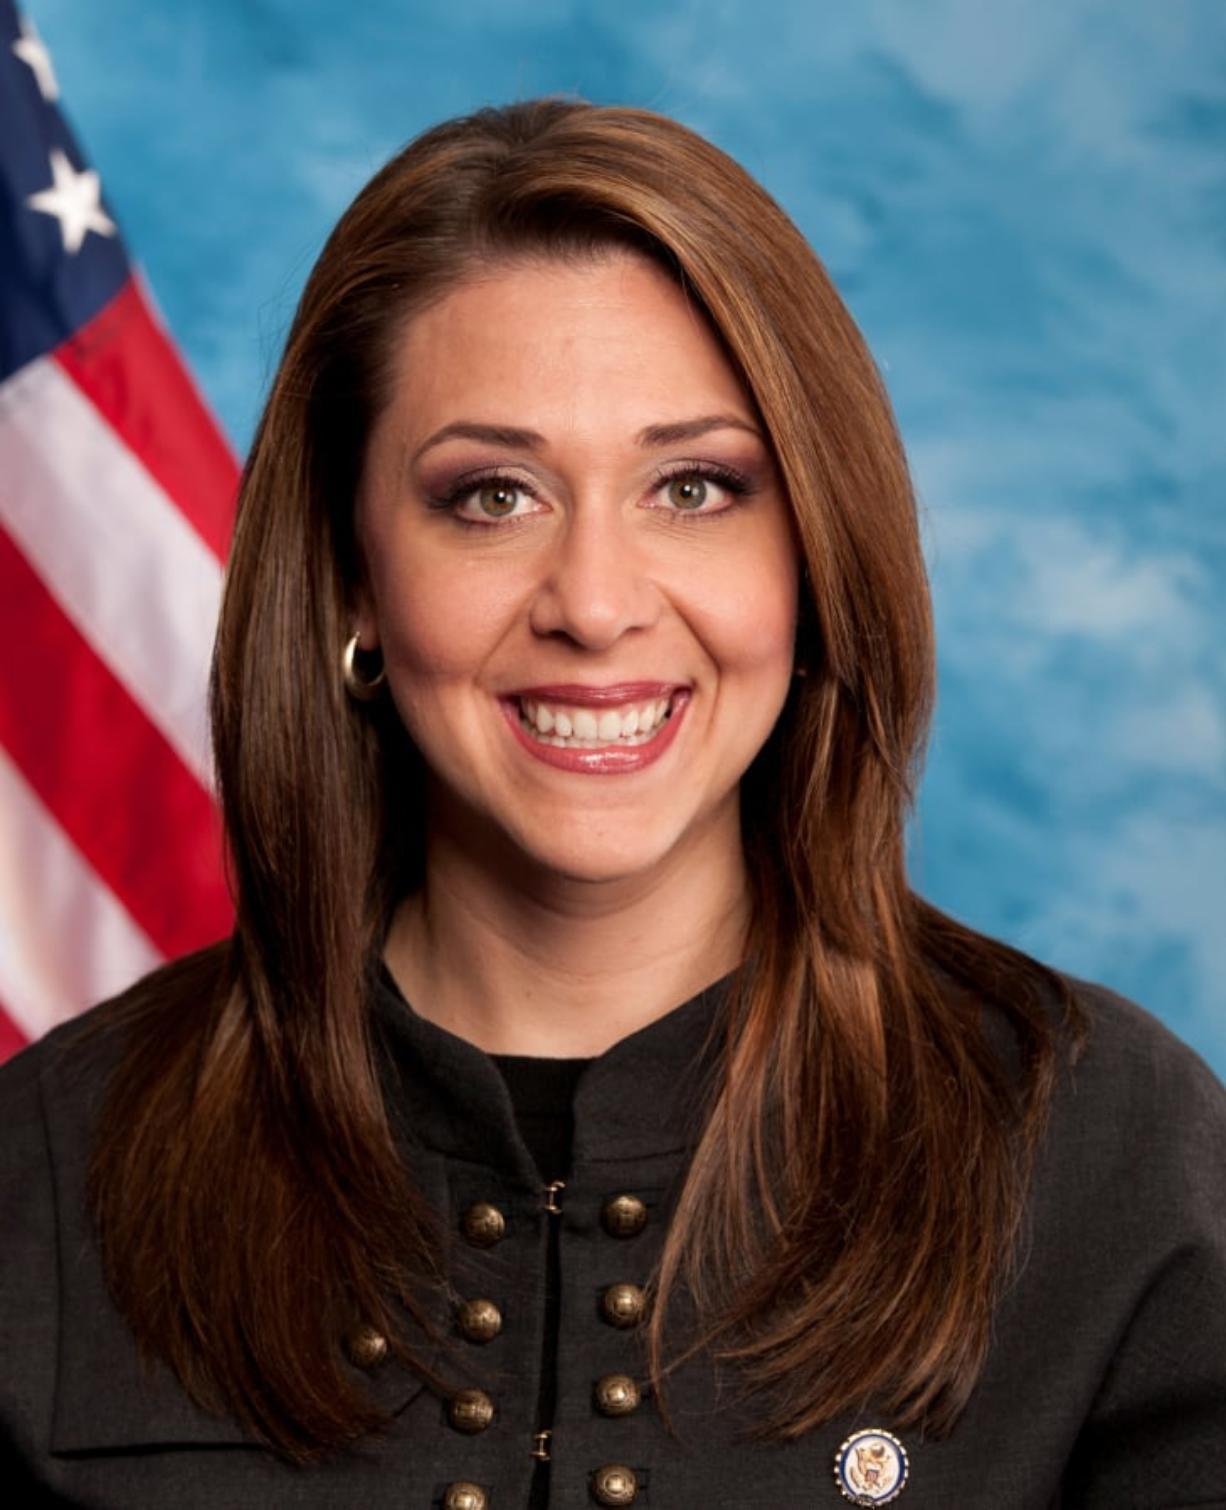 Rep. Jaime Herrera Beutler